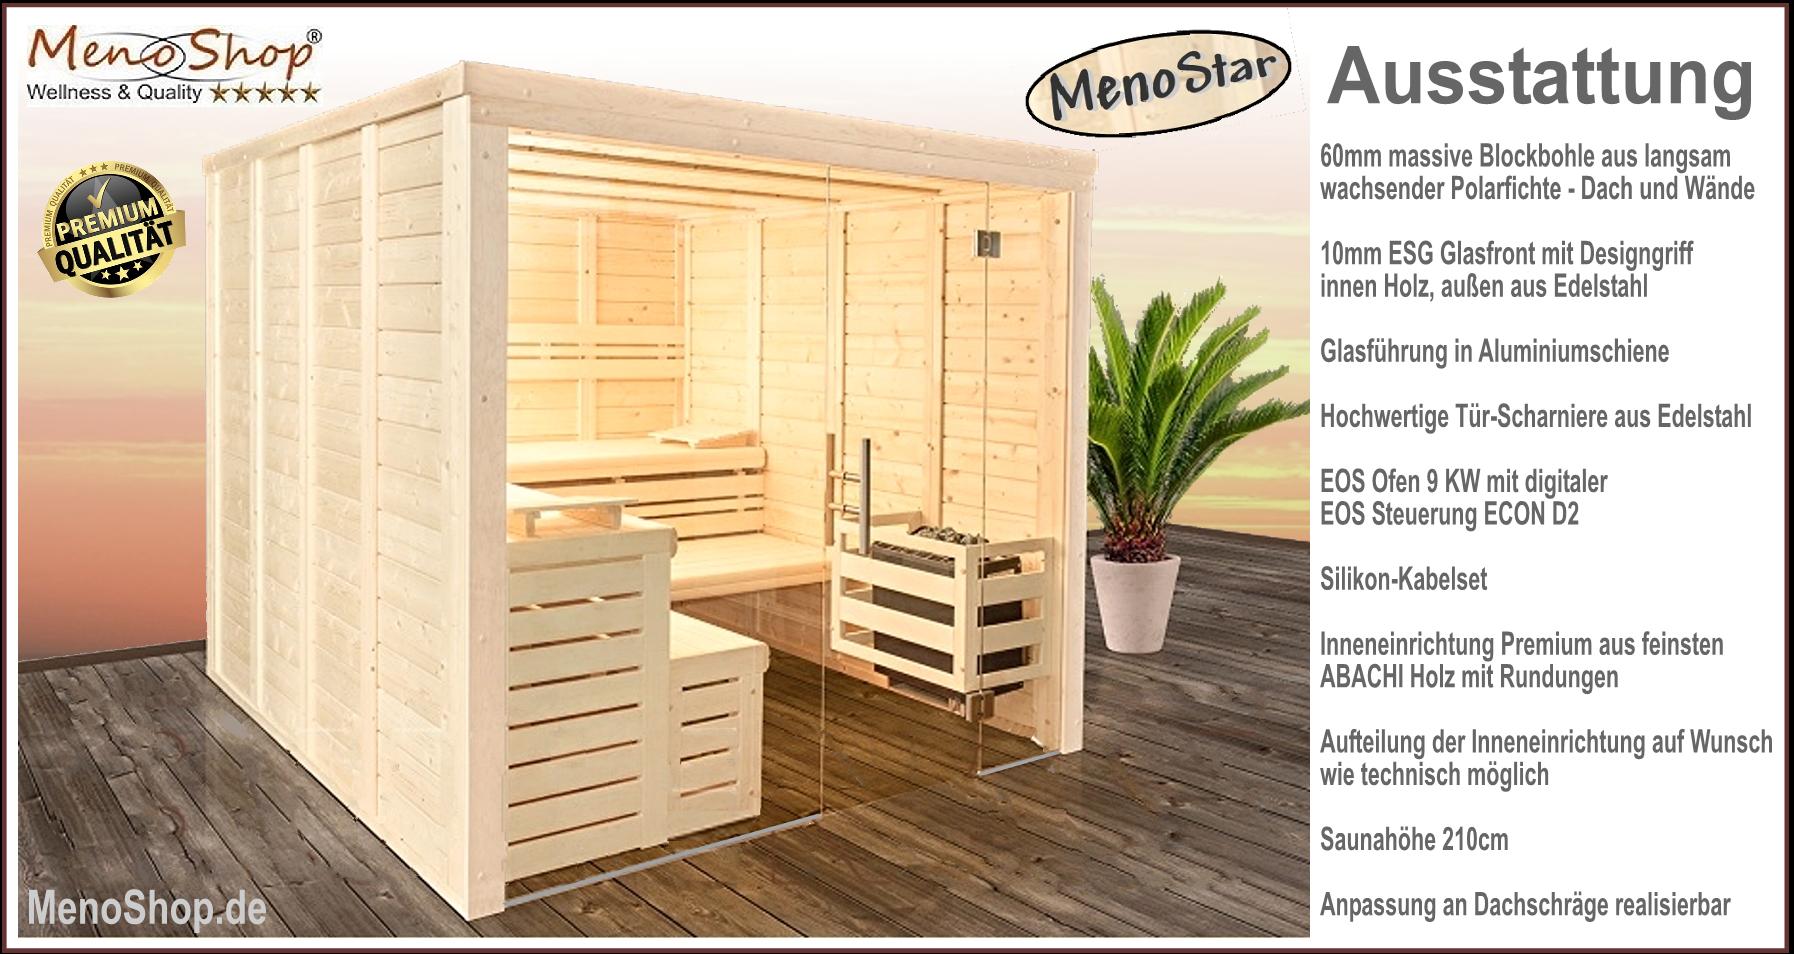 MASSIVHOLZSAUNA Meno-Star 60mm + Glasfront - WELLNESS & SAUNA